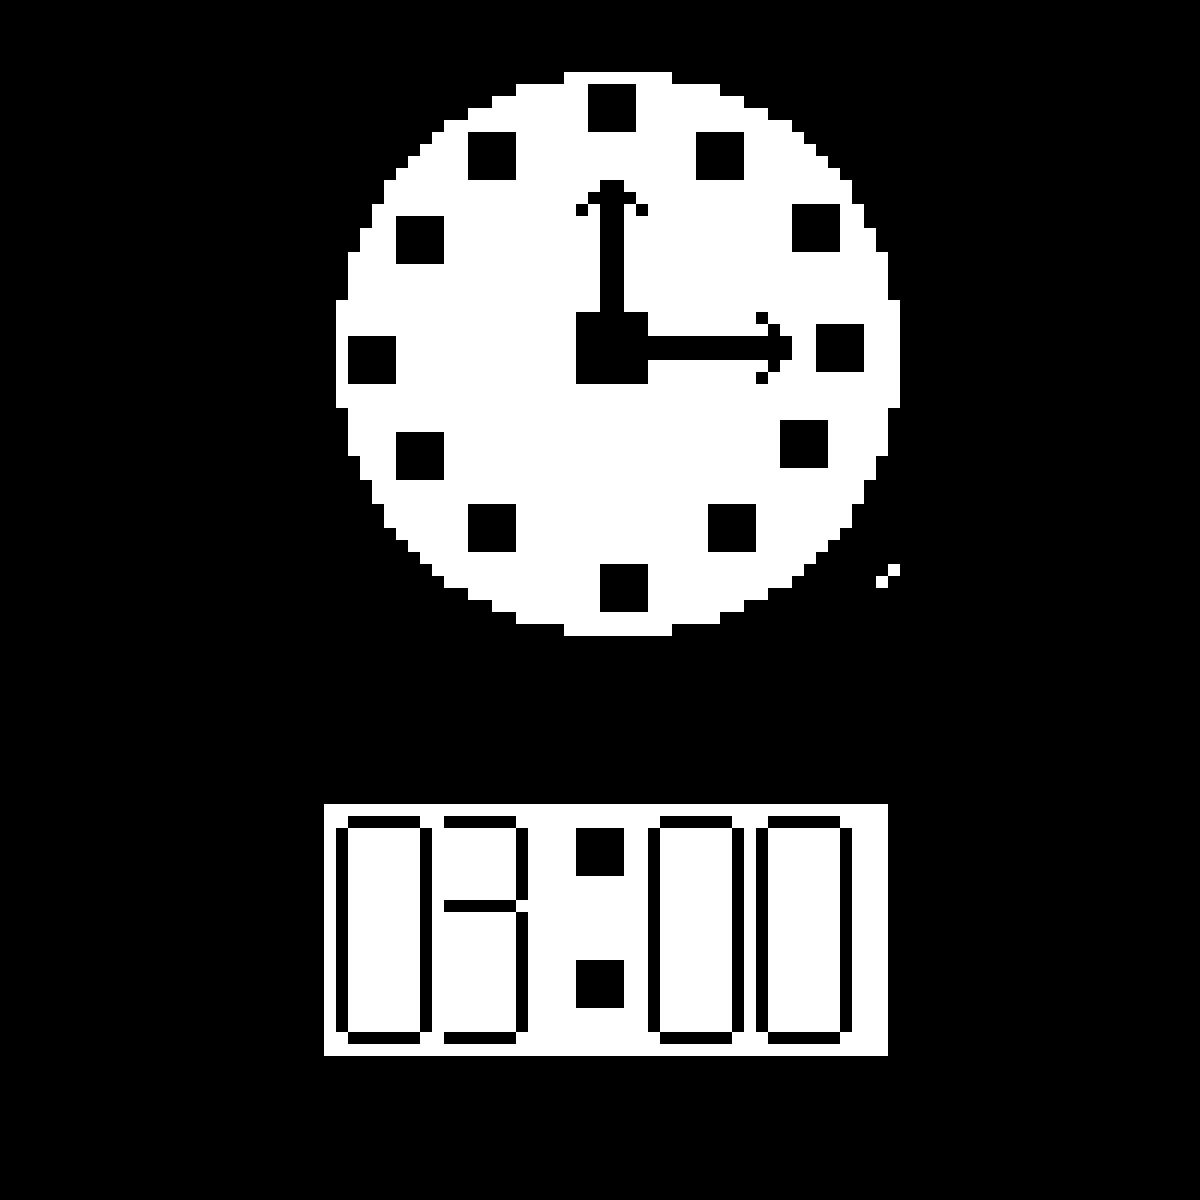 clock by sedge123